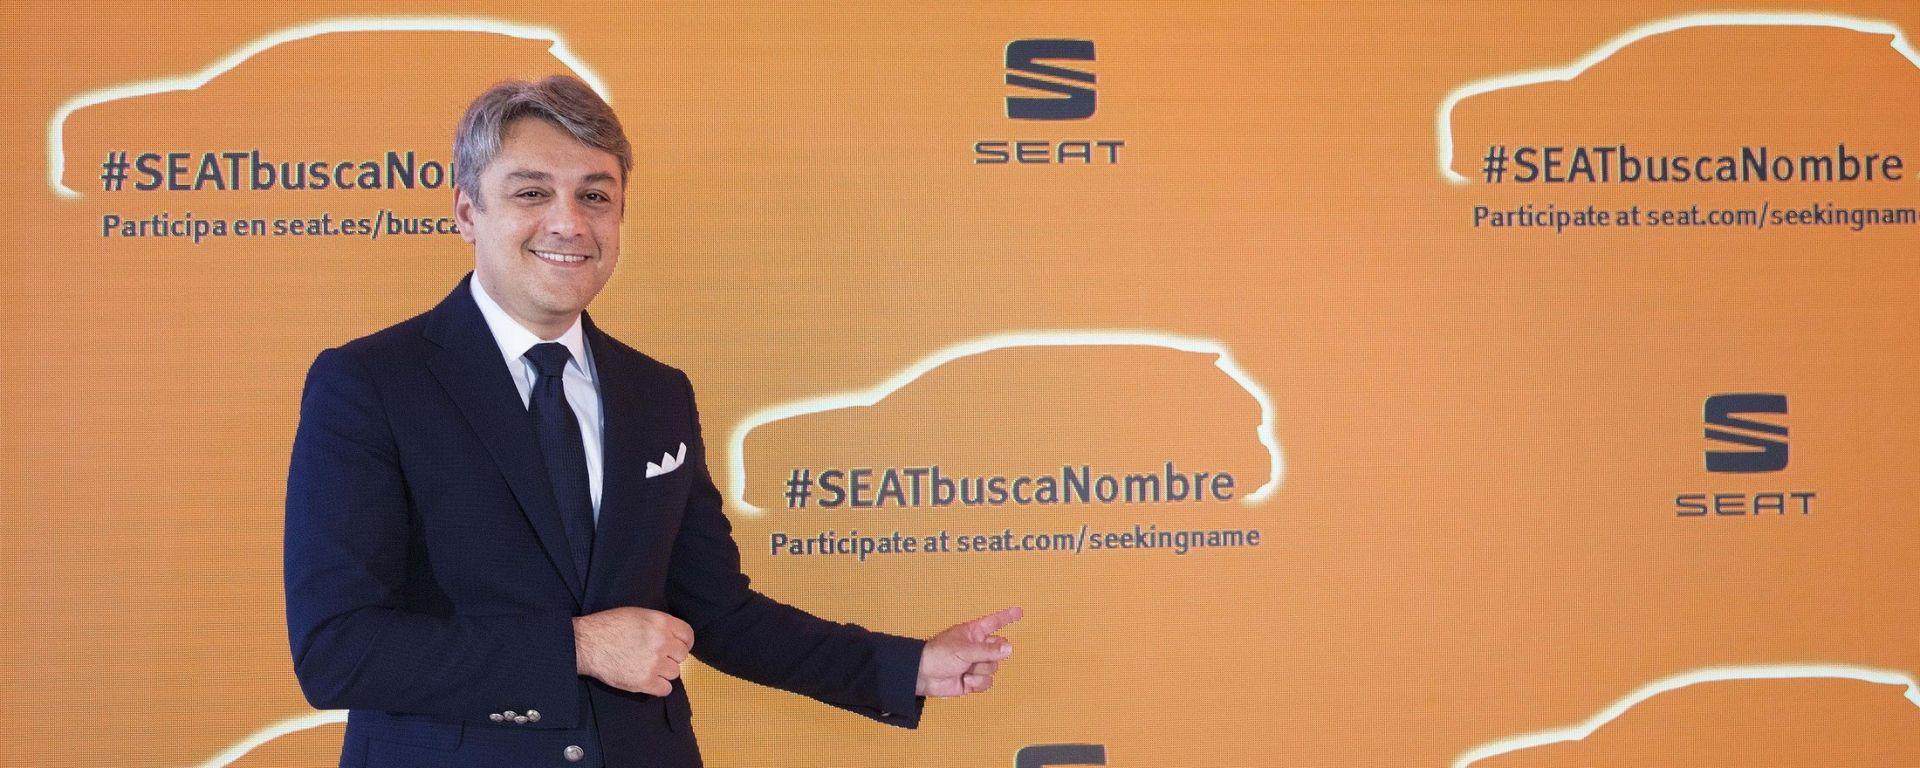 Luca de Meo, presidente Seat, lancia il concorso #SEATSeekingName